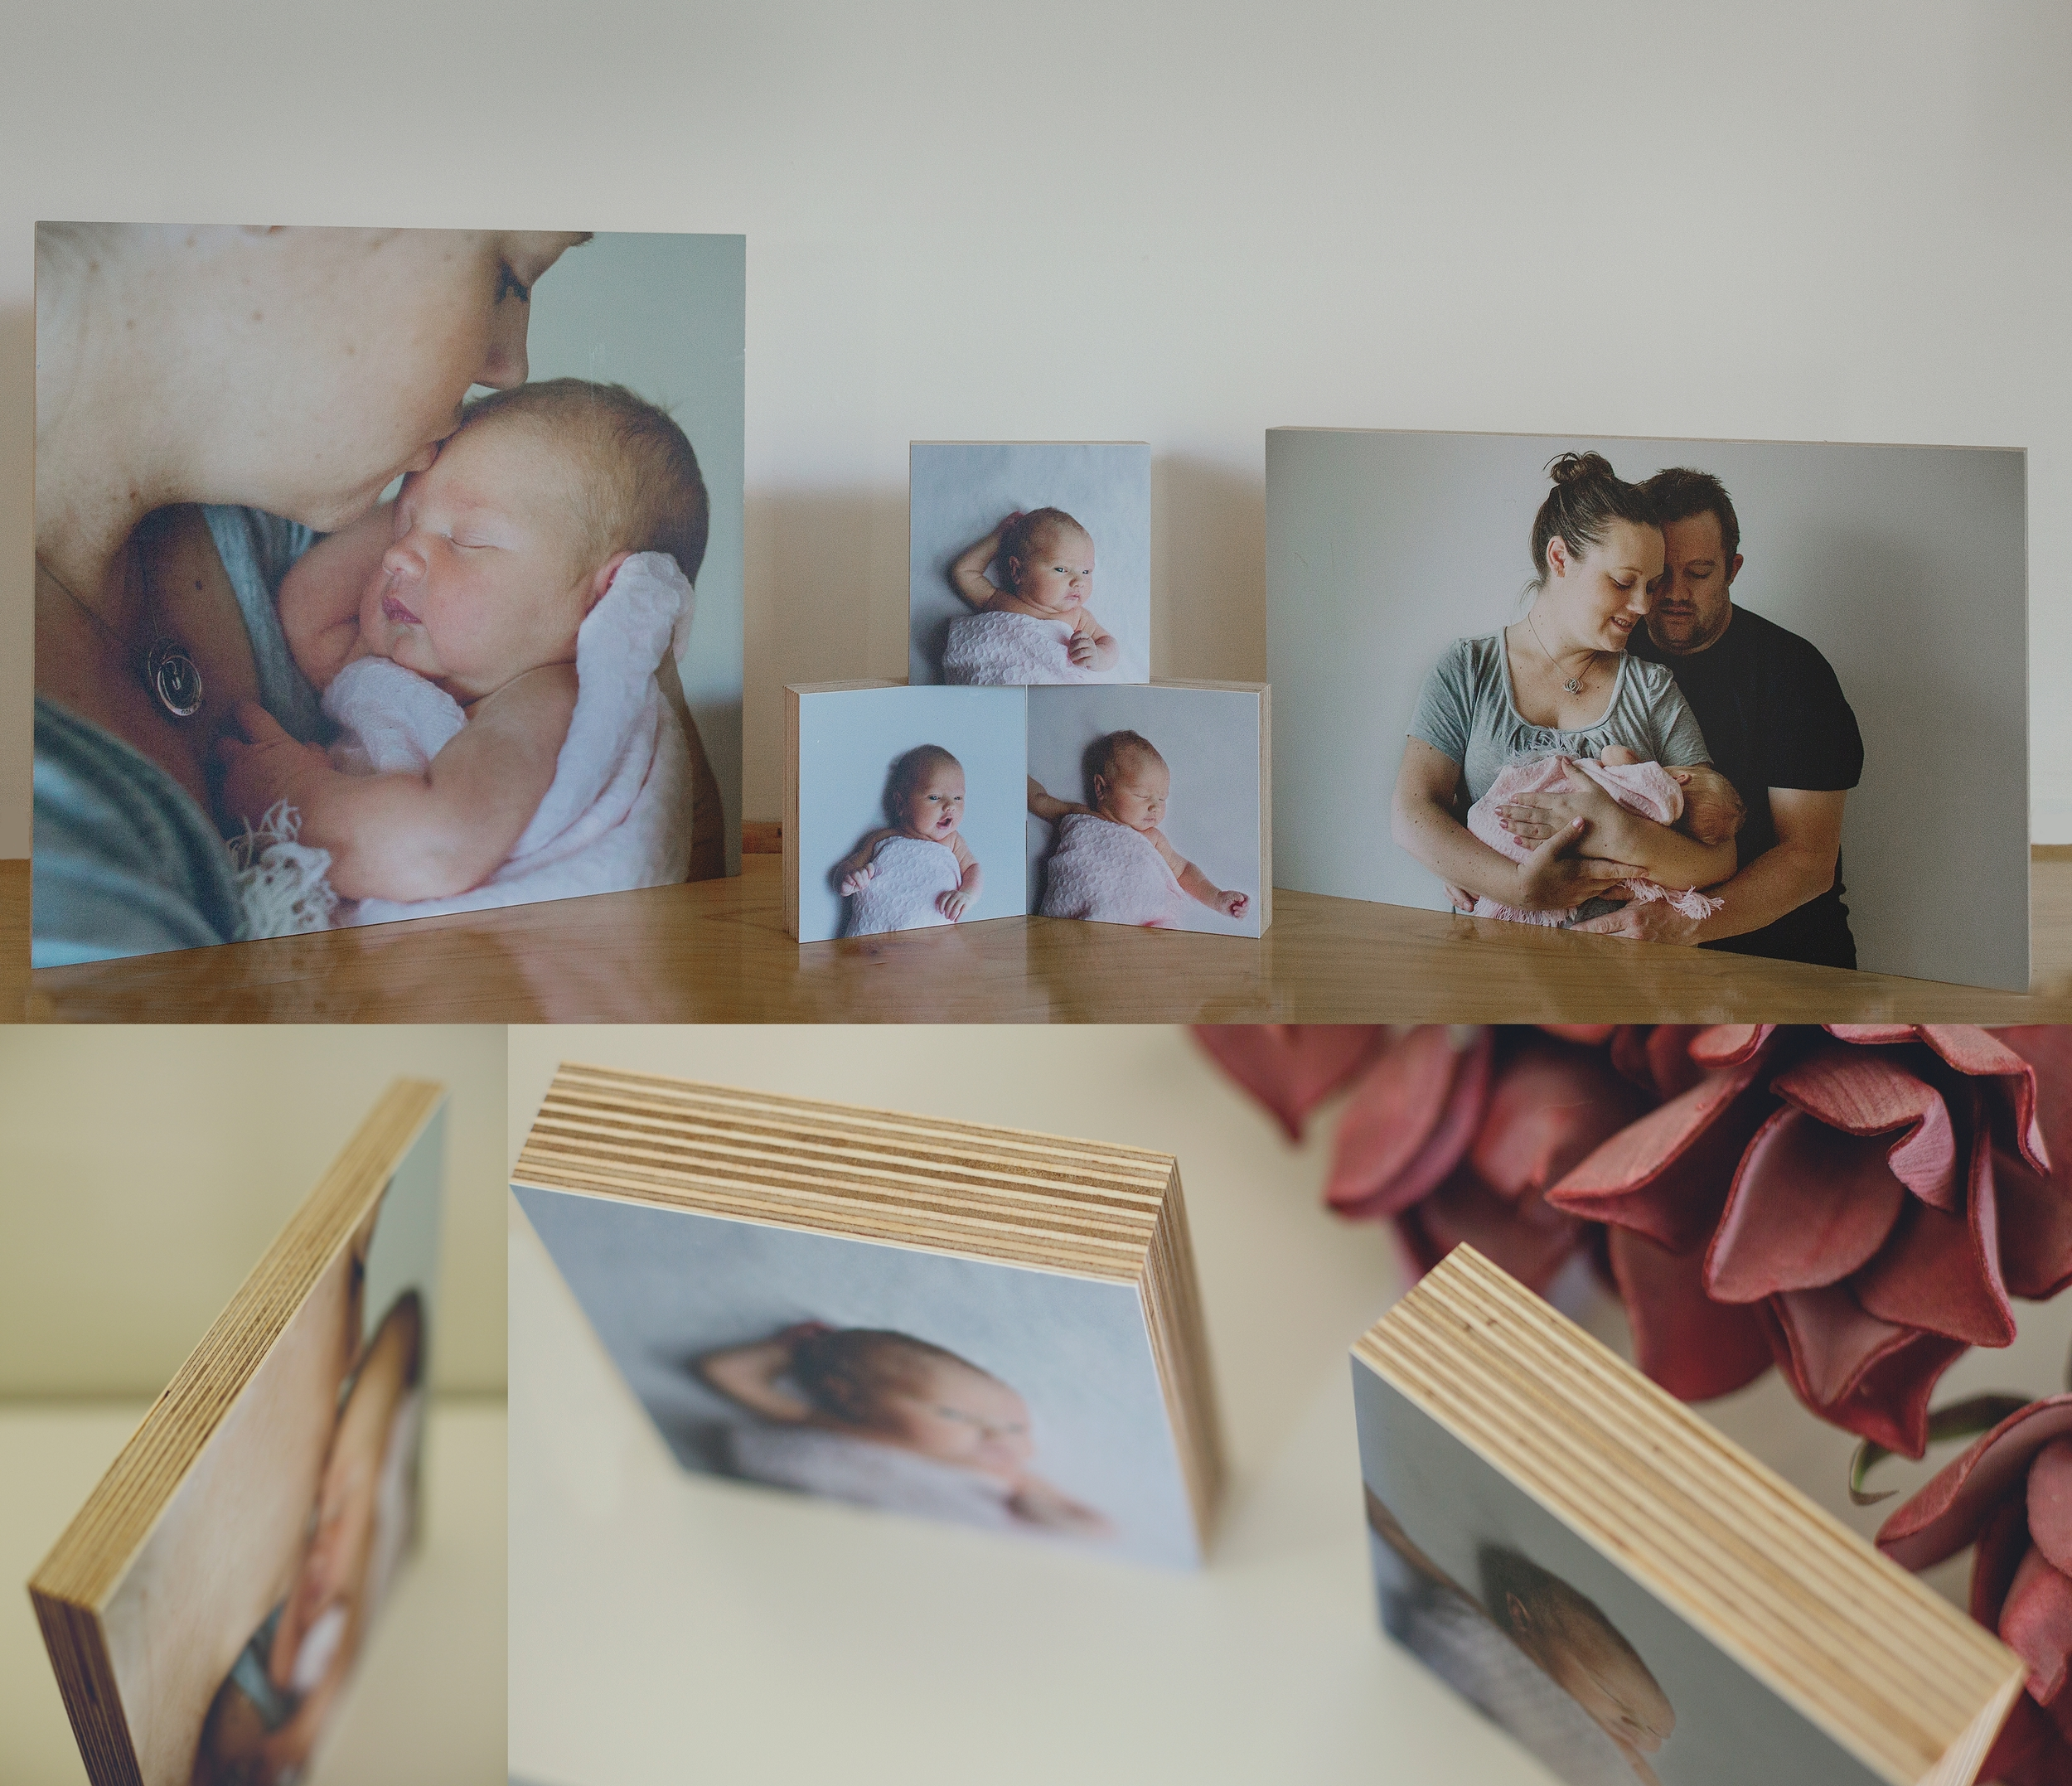 Family Photos printed on birch wood blocks!